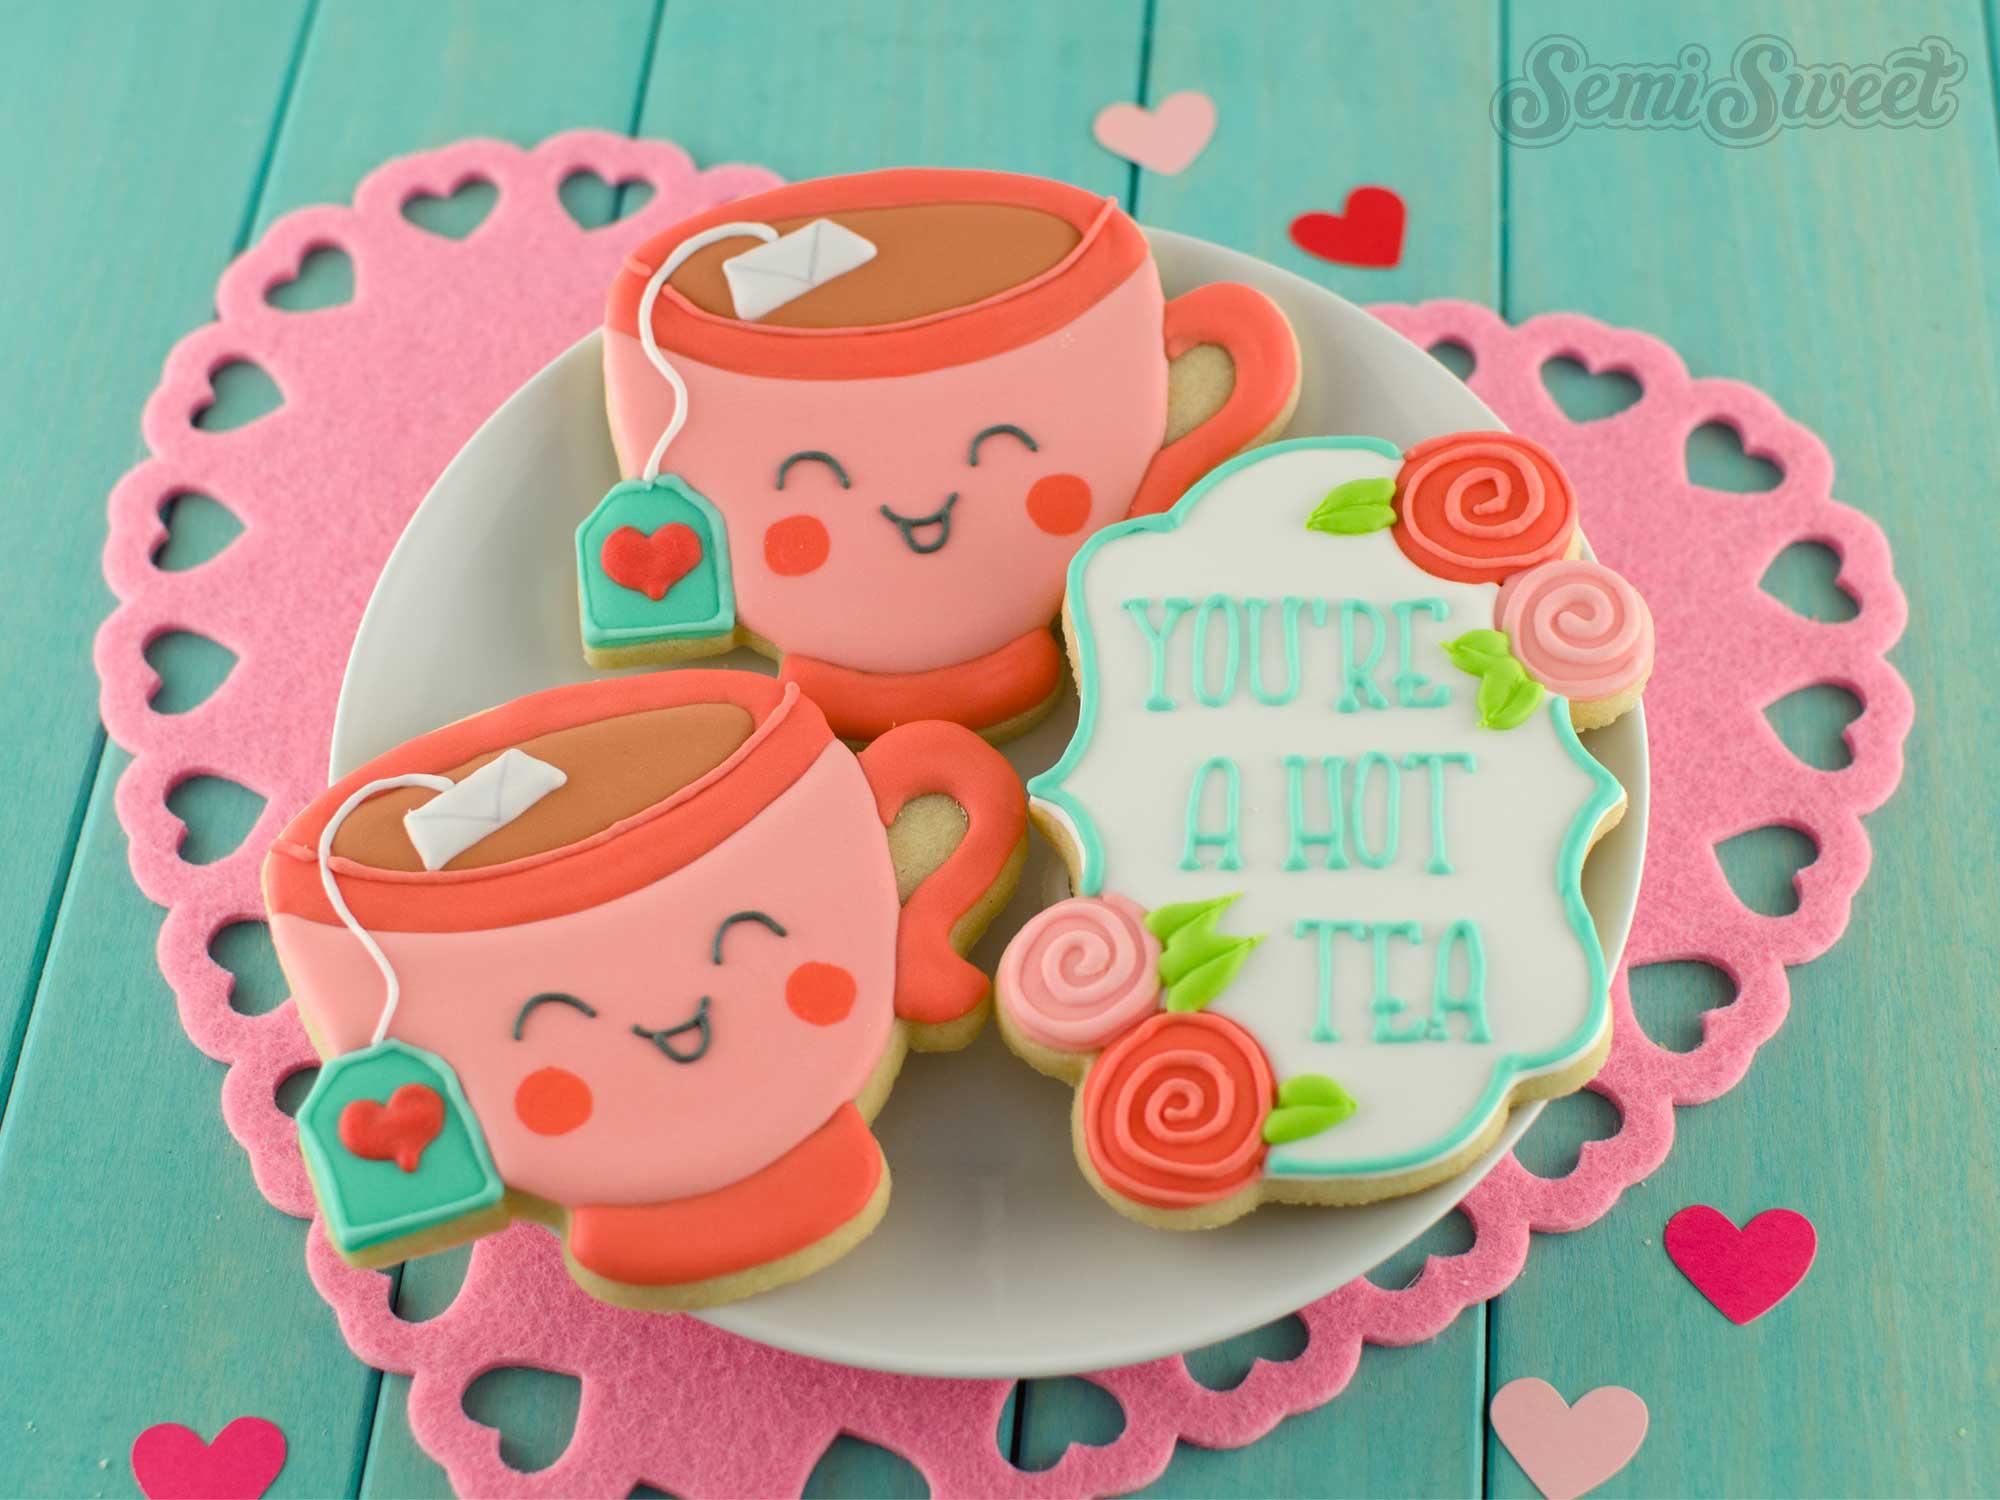 How to Make Teacup Cookies